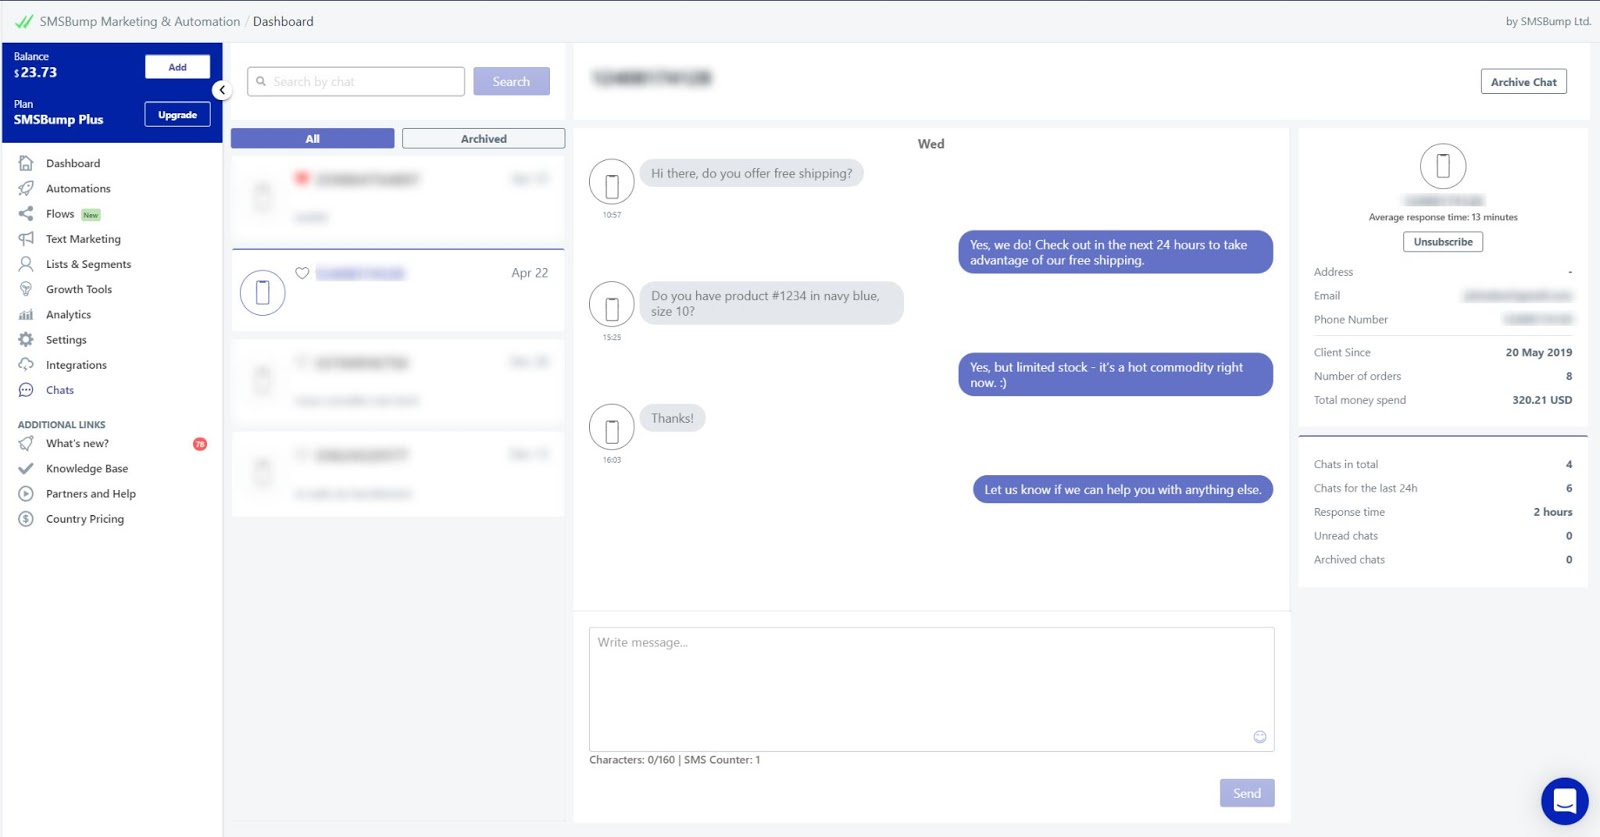 SMSBump_chat_Reamaze